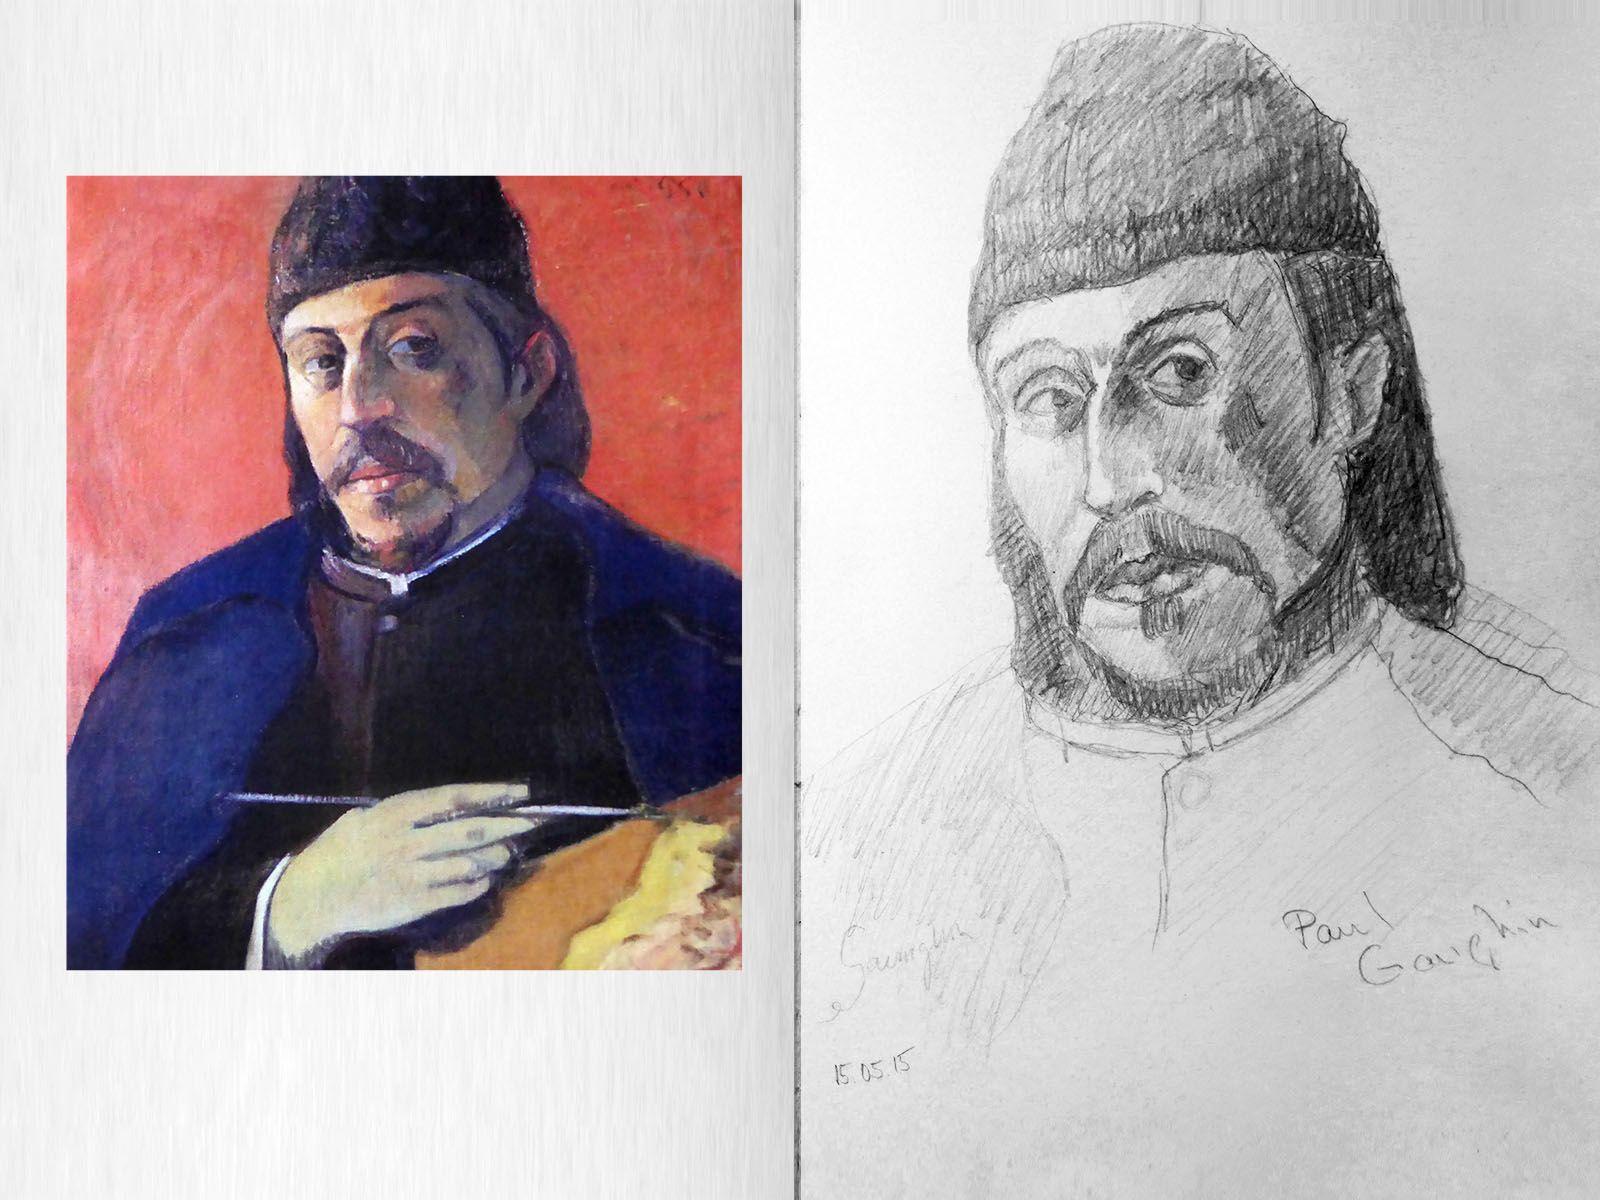 Studie zu Paul Gauguin, Selbstbildnis, Michael Basler, www.aquarts.de